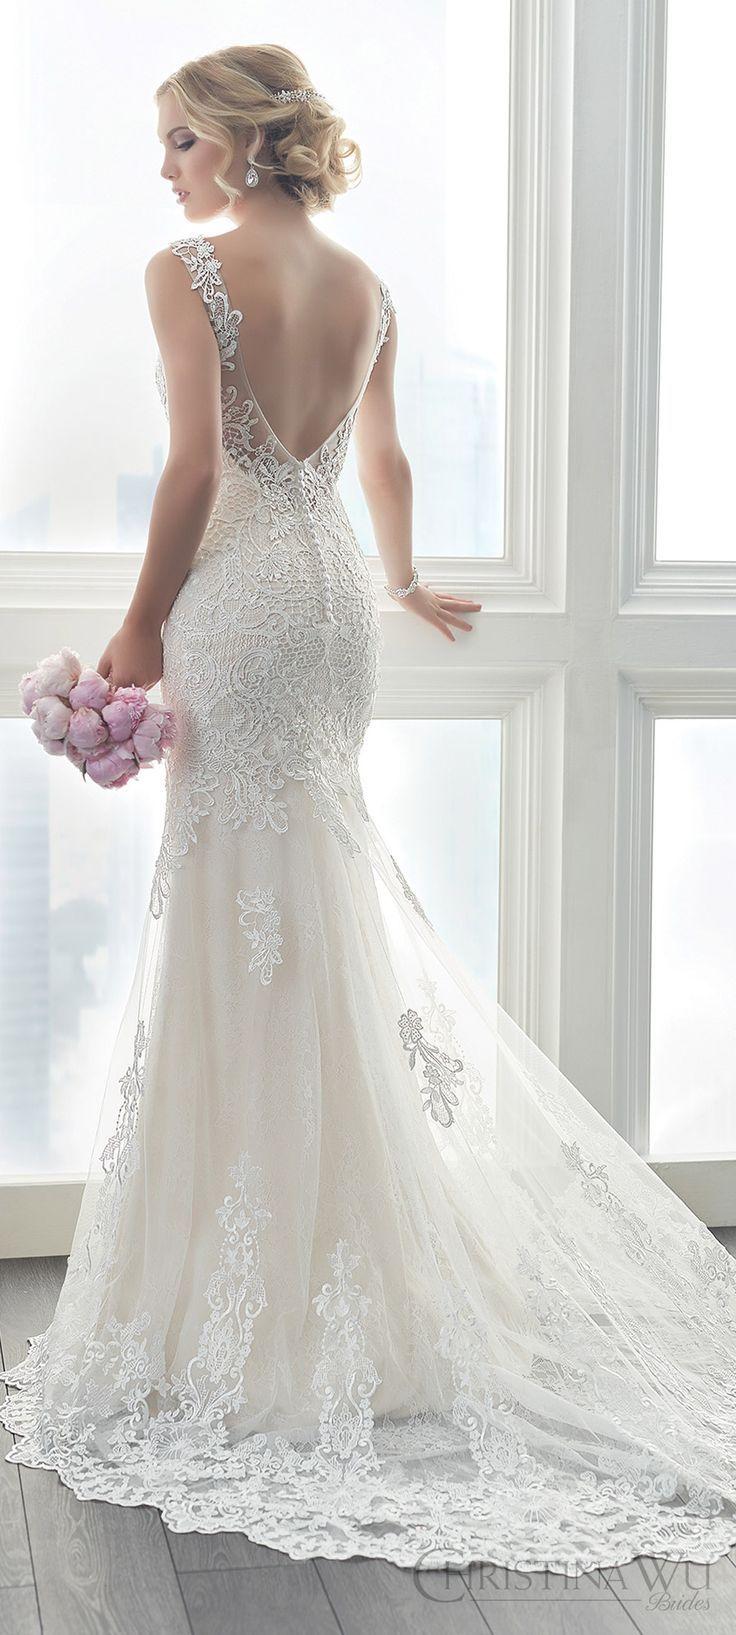 The 25 best wedding dress straps ideas on pinterest for Used wedding dresses fort wayne indiana